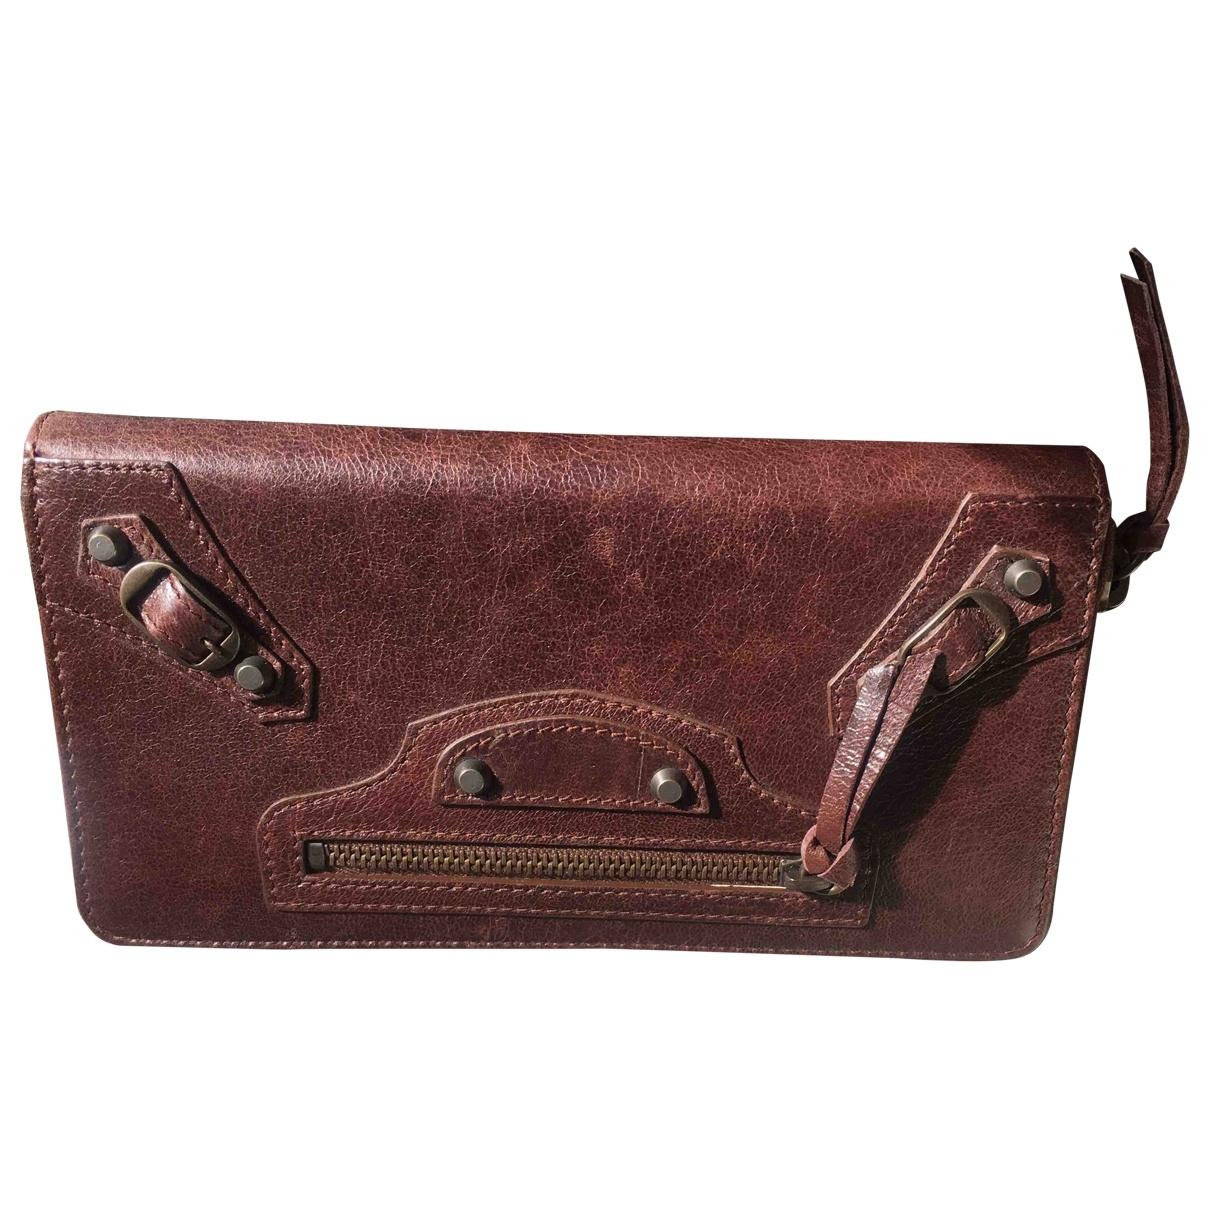 Balenciaga \N Brown Leather wallet for Women \N